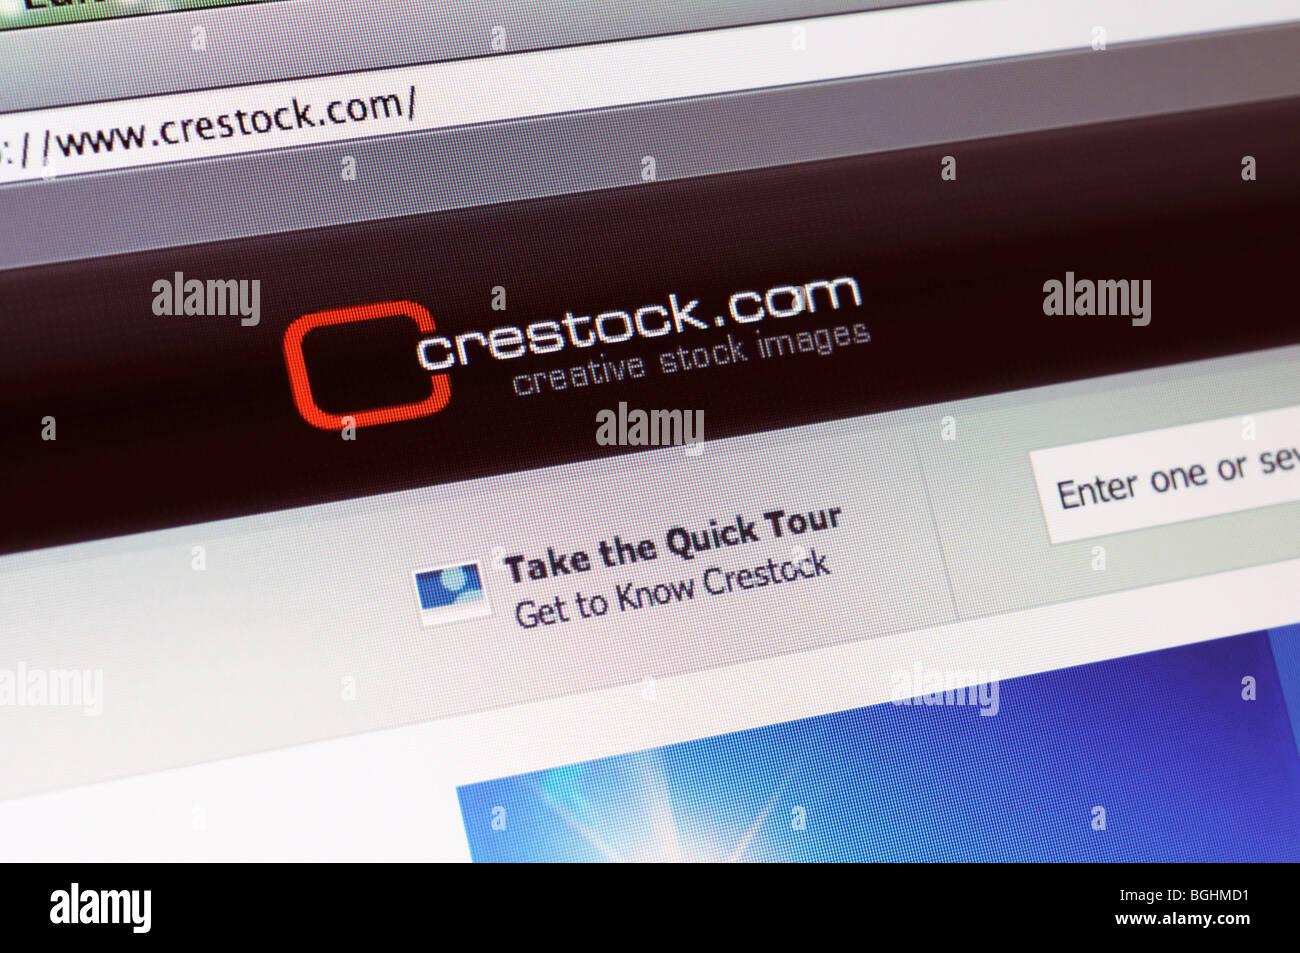 Crestock image agency website - Stock Image